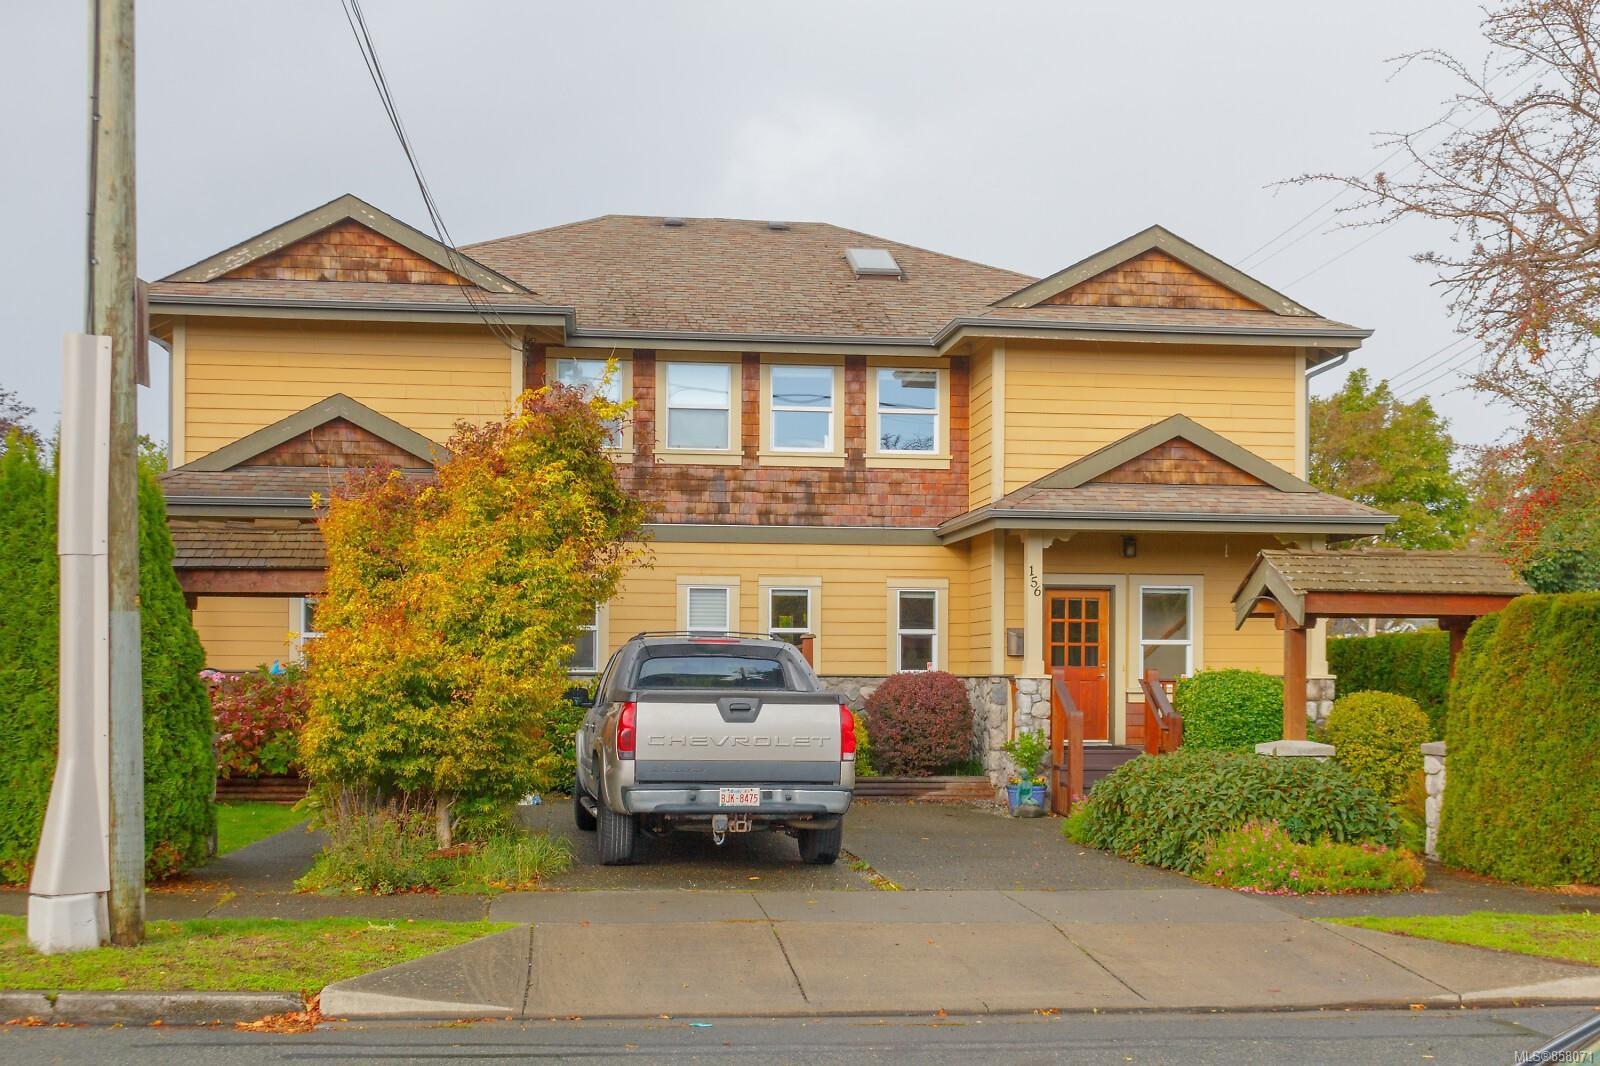 Main Photo: 156 Linden Ave in : Vi Fairfield West Half Duplex for sale (Victoria)  : MLS®# 858071